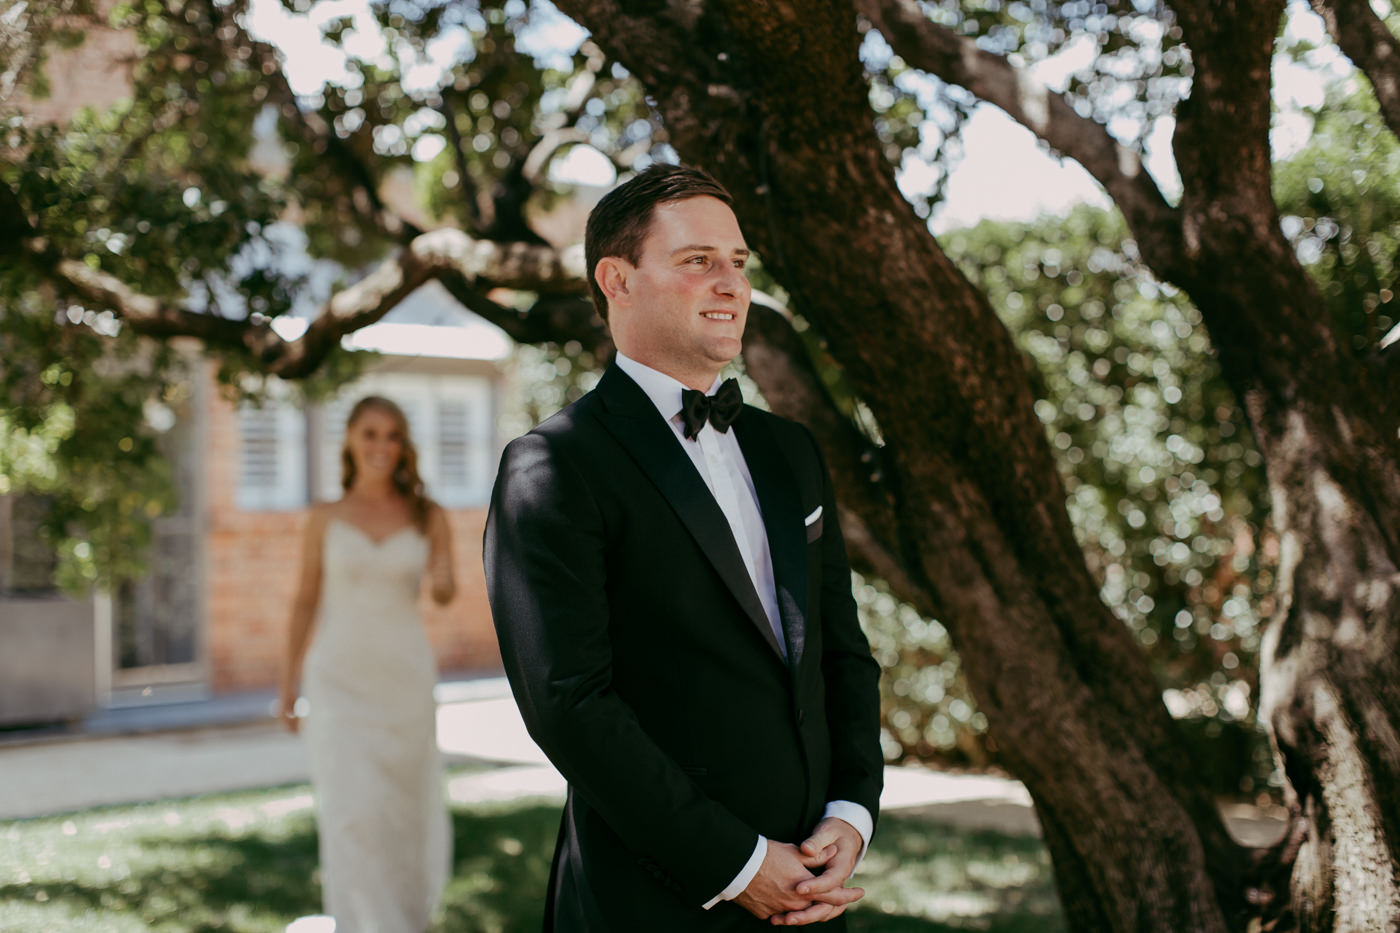 Anthony & Eliet - Wagga Wagga Wedding - Country NSW - Samantha Heather Photography-35.jpg